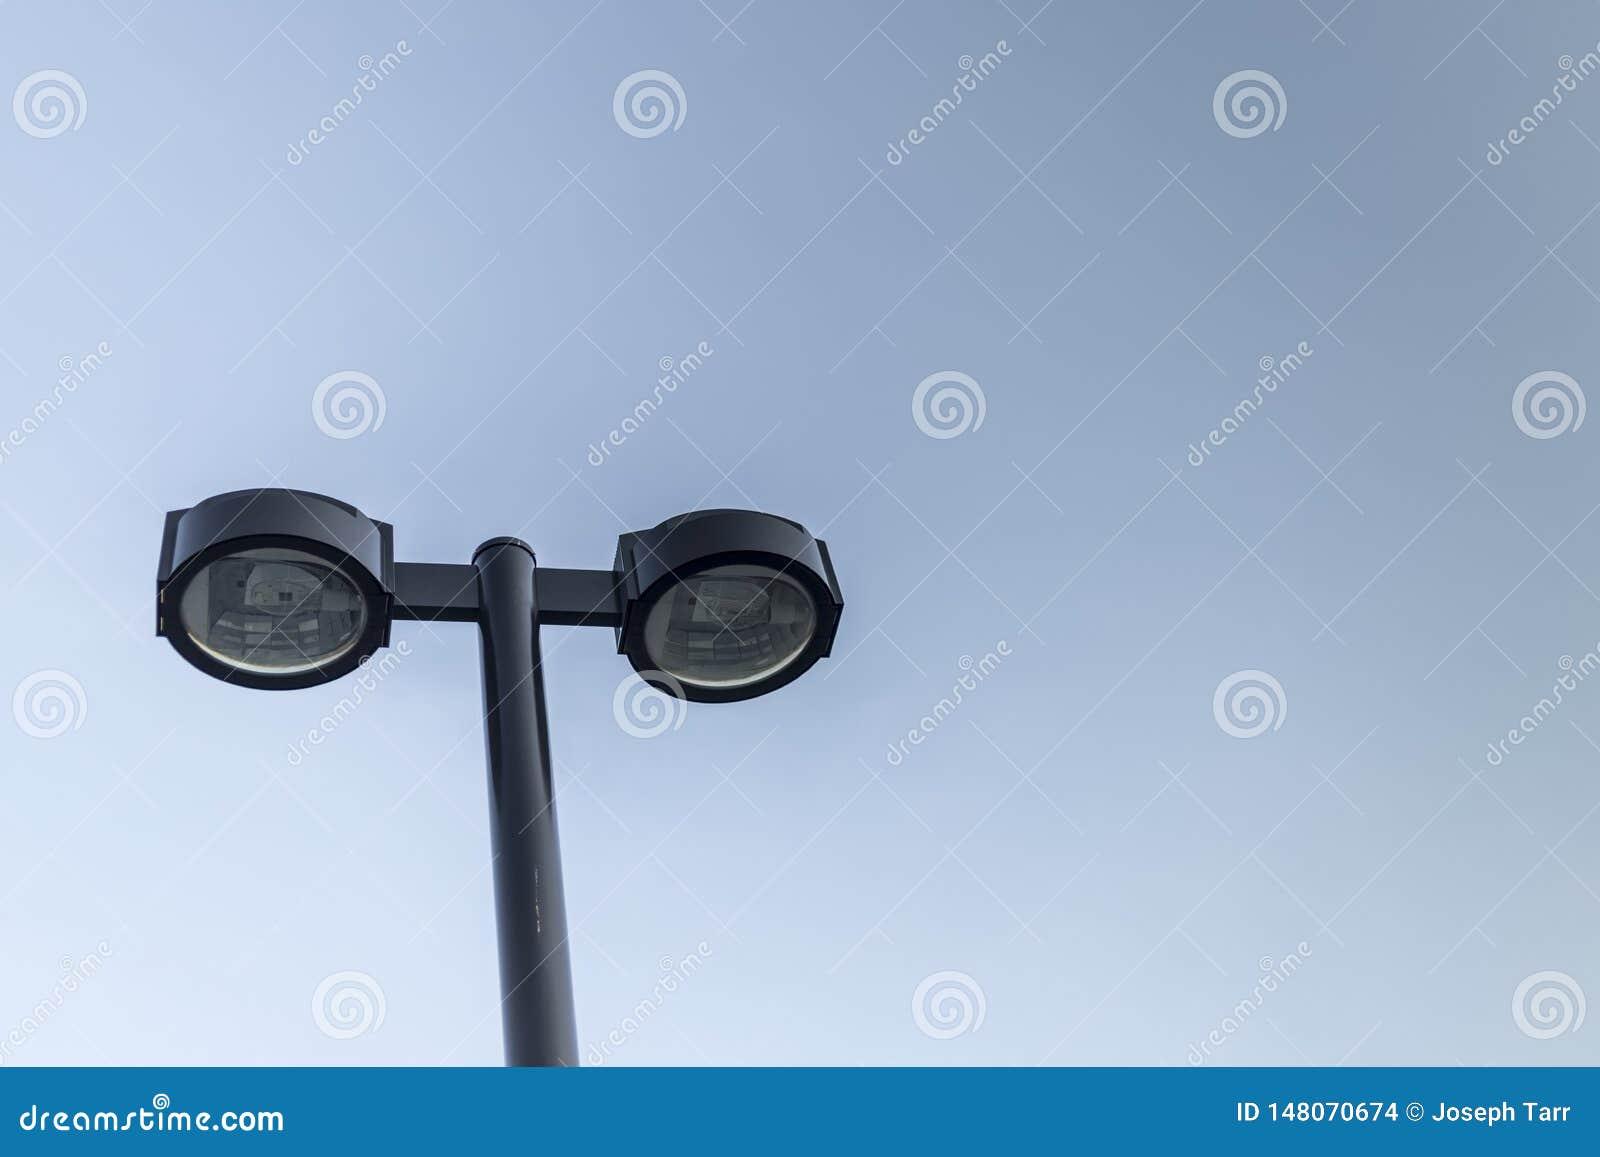 Dubbele Straatlantaarn over Lichtblauwe Hemel met CopySpace